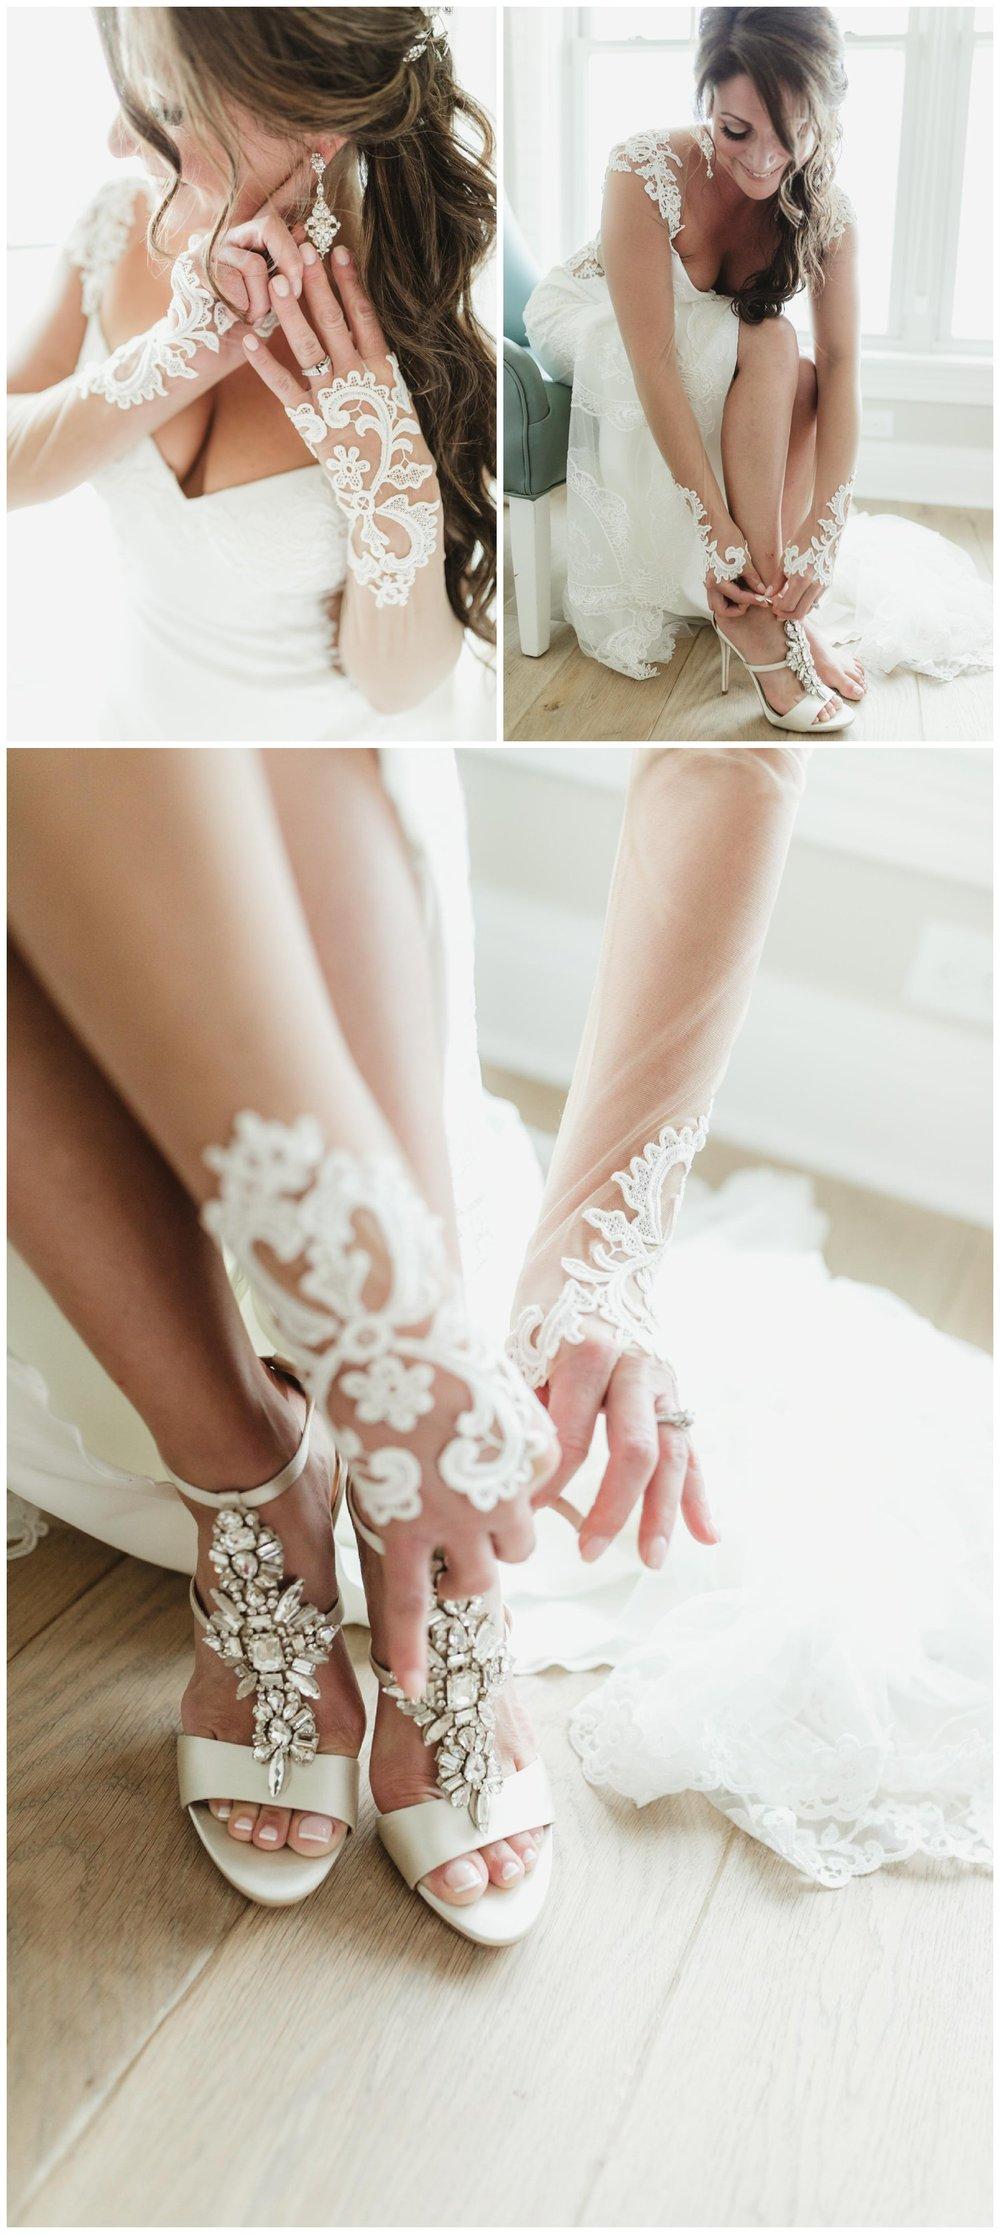 JillandLennon_TheReeds_ShelterHaven_StoneHarbor_NJ_NewJersey__SouthJersey_Wedding_Photographer_MagdalenaStudios_0301.jpg